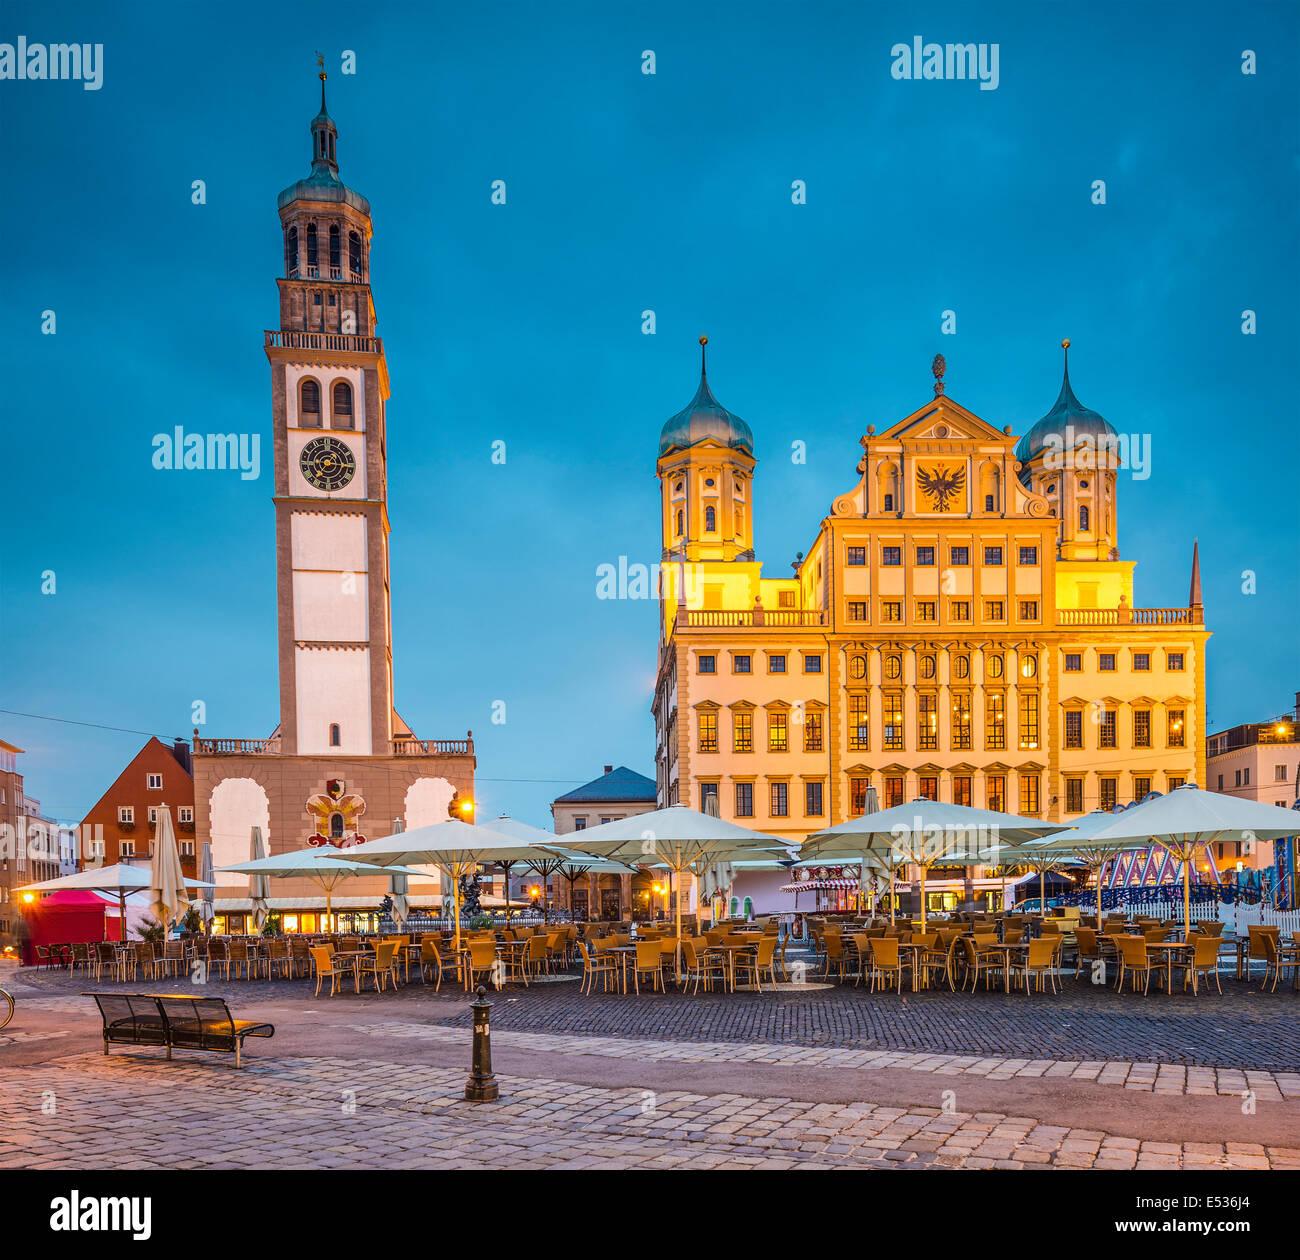 Augsburg, Germany town scape at Rathausplatz Plaza. - Stock Image